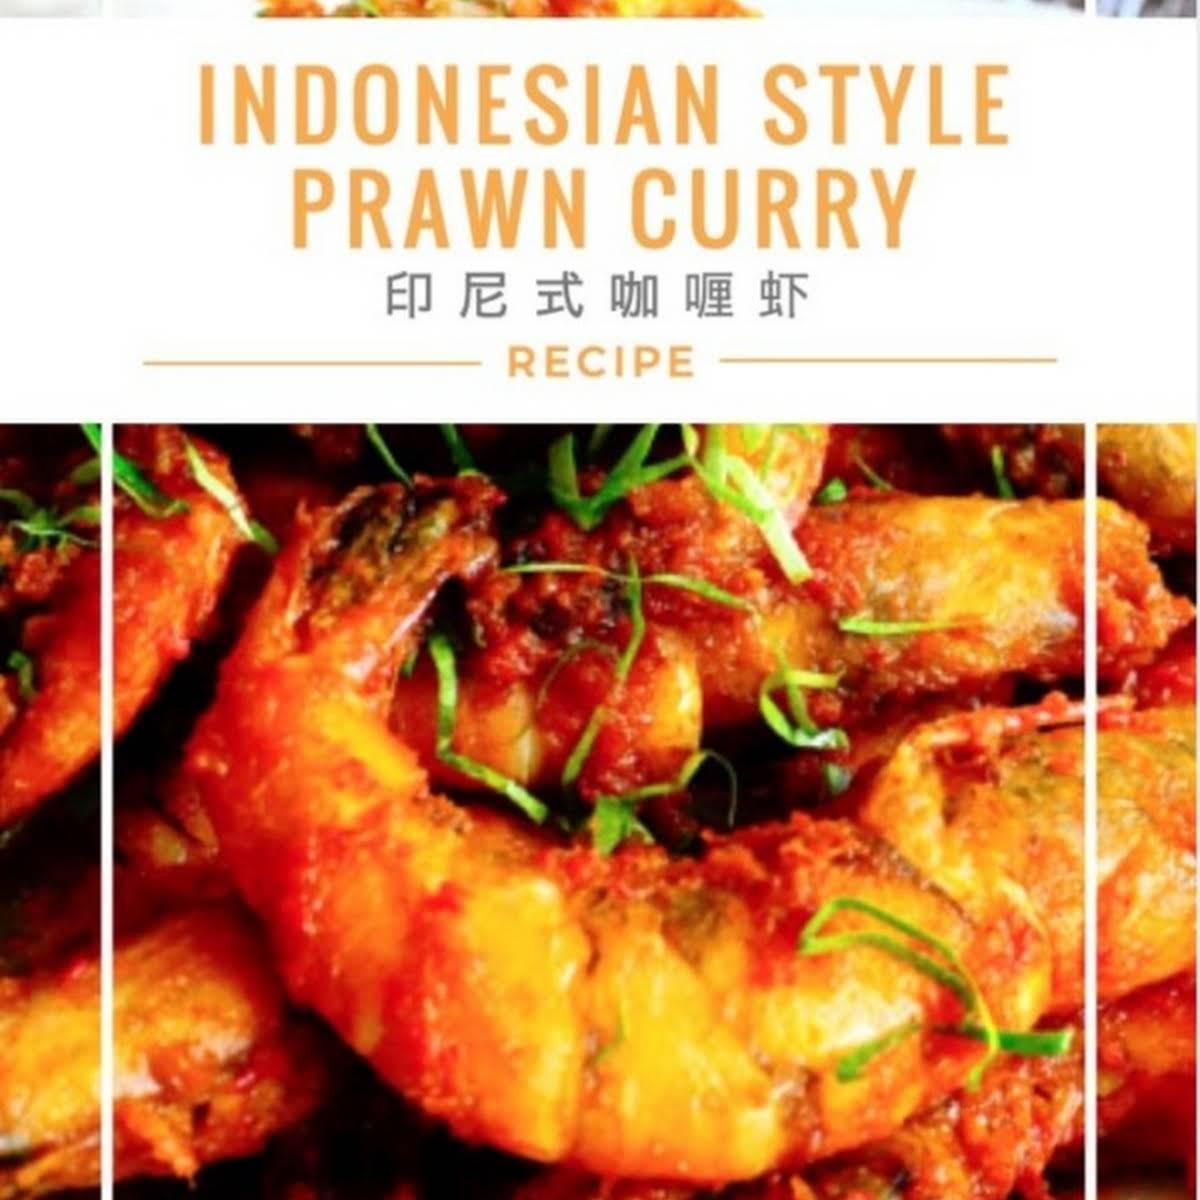 Indonesian Prawn Curry 印尼咖喱虾